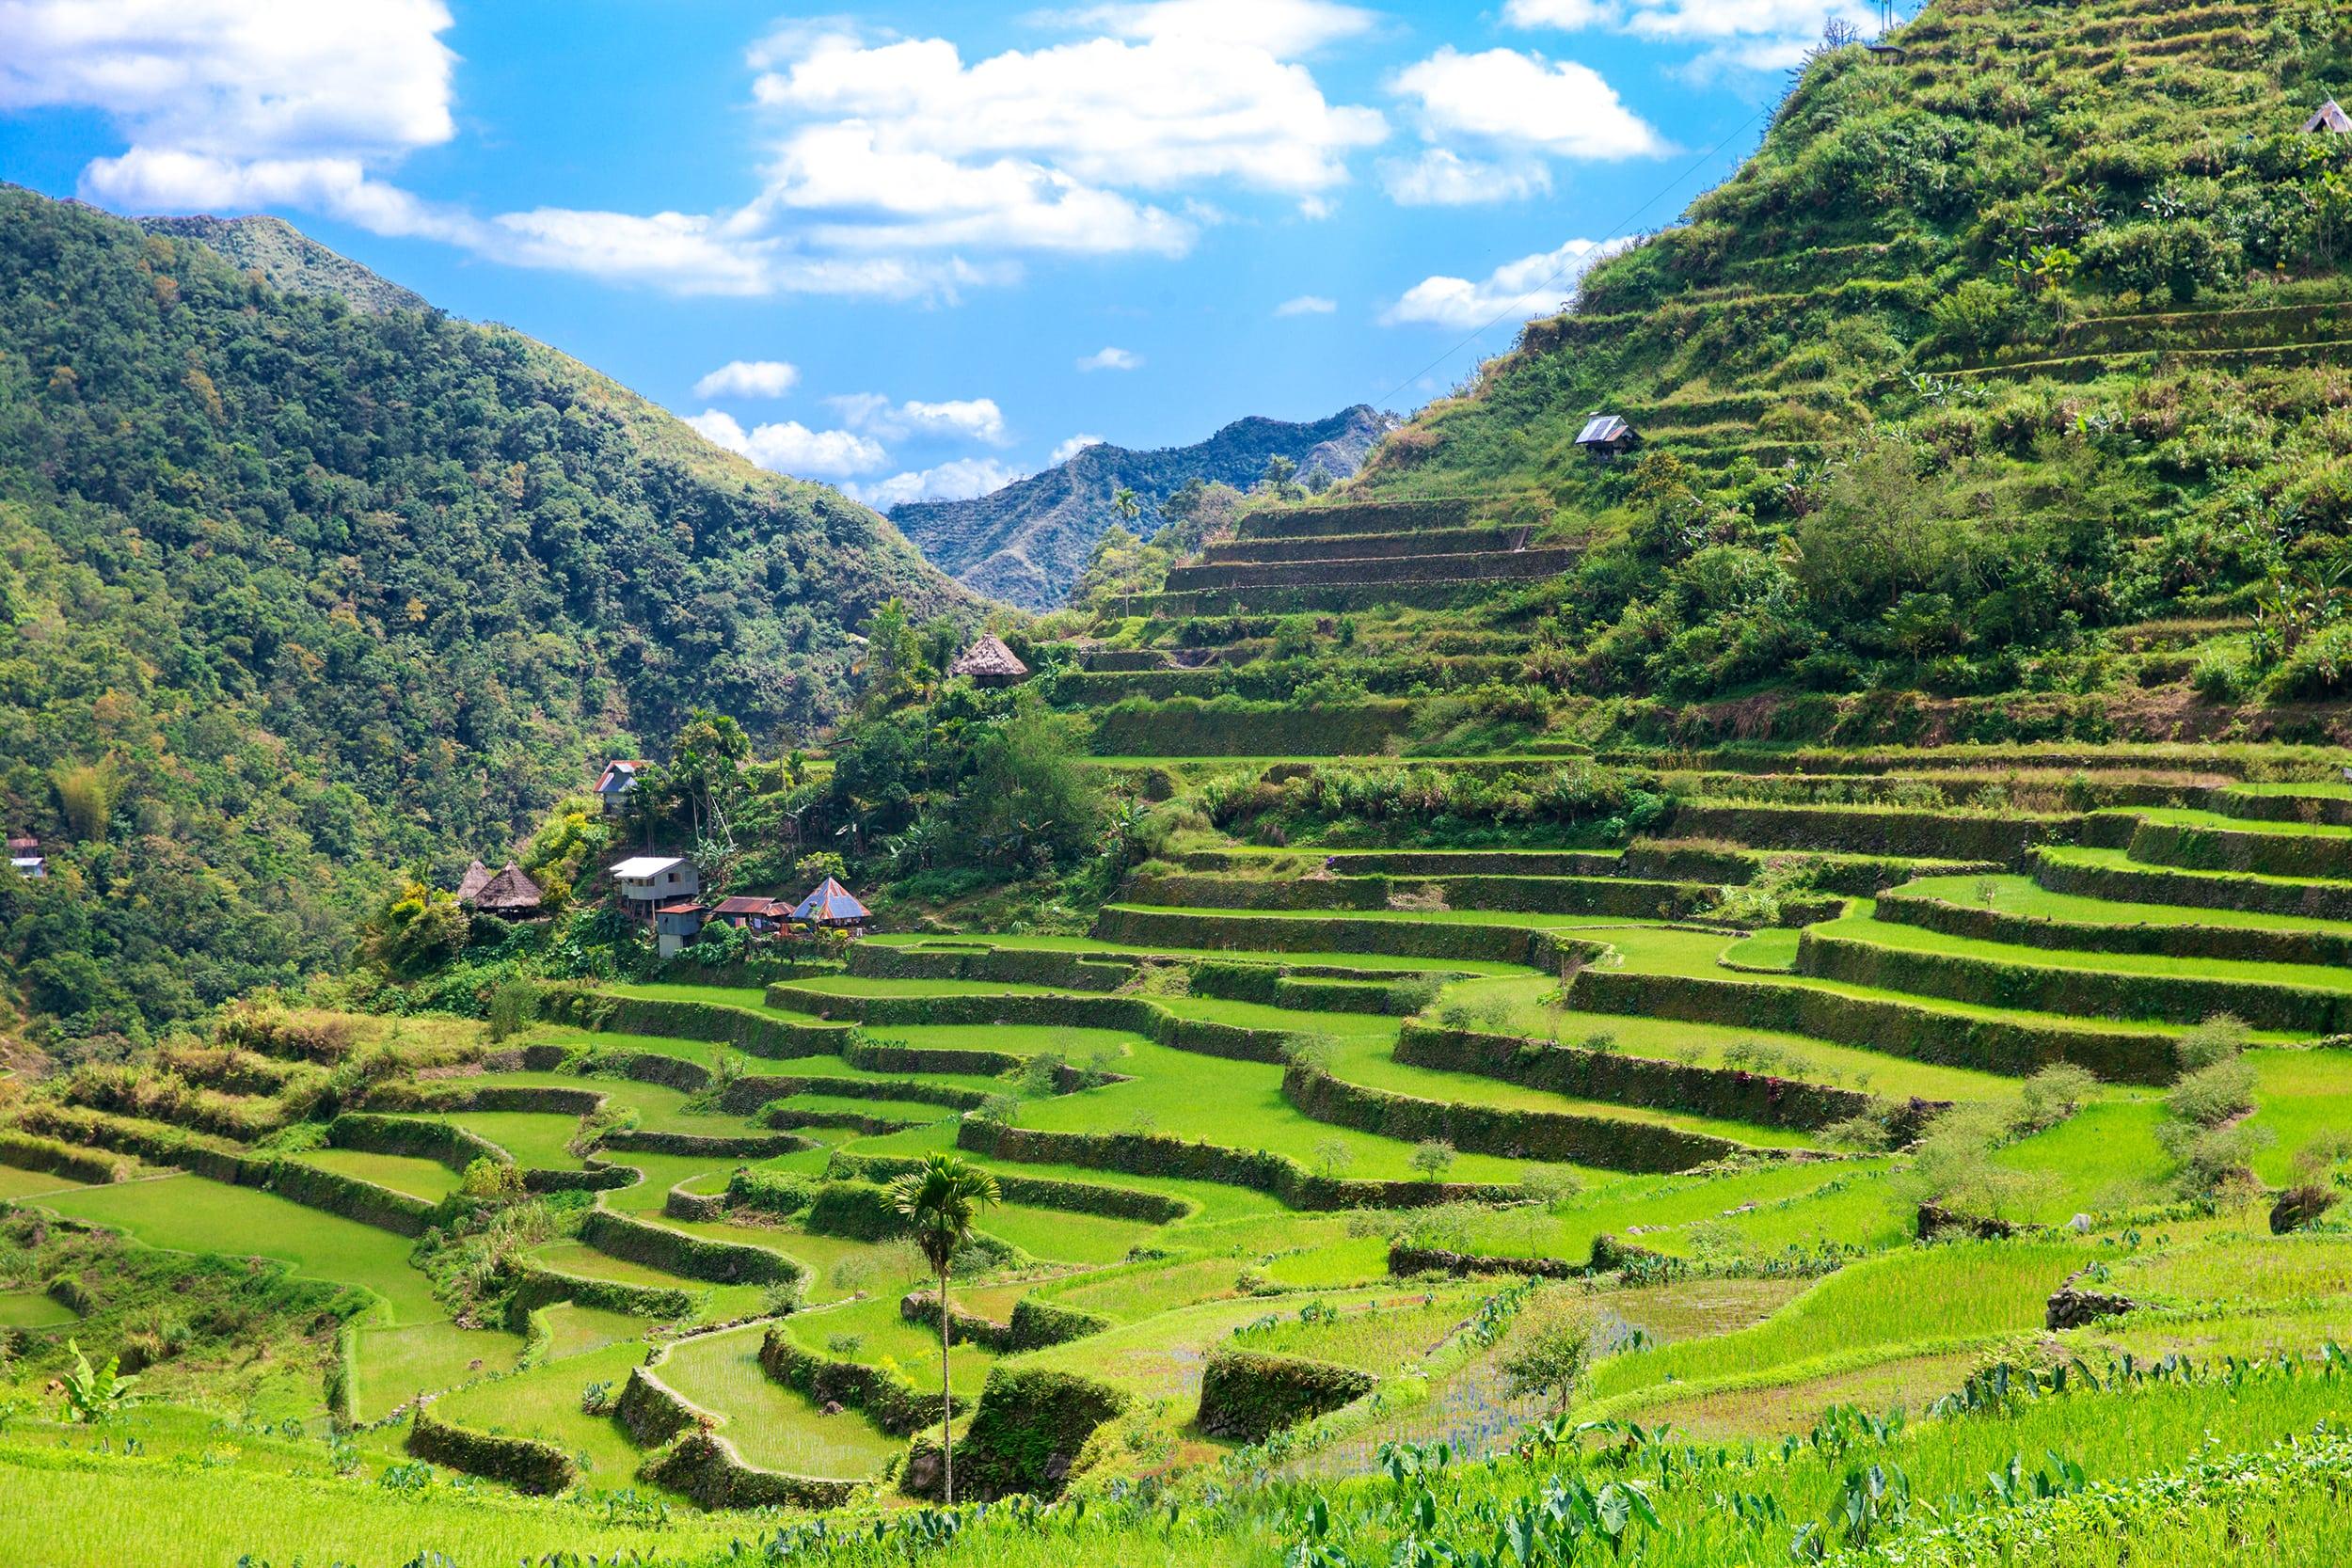 Lush green landscape of Batad Rice Terraces